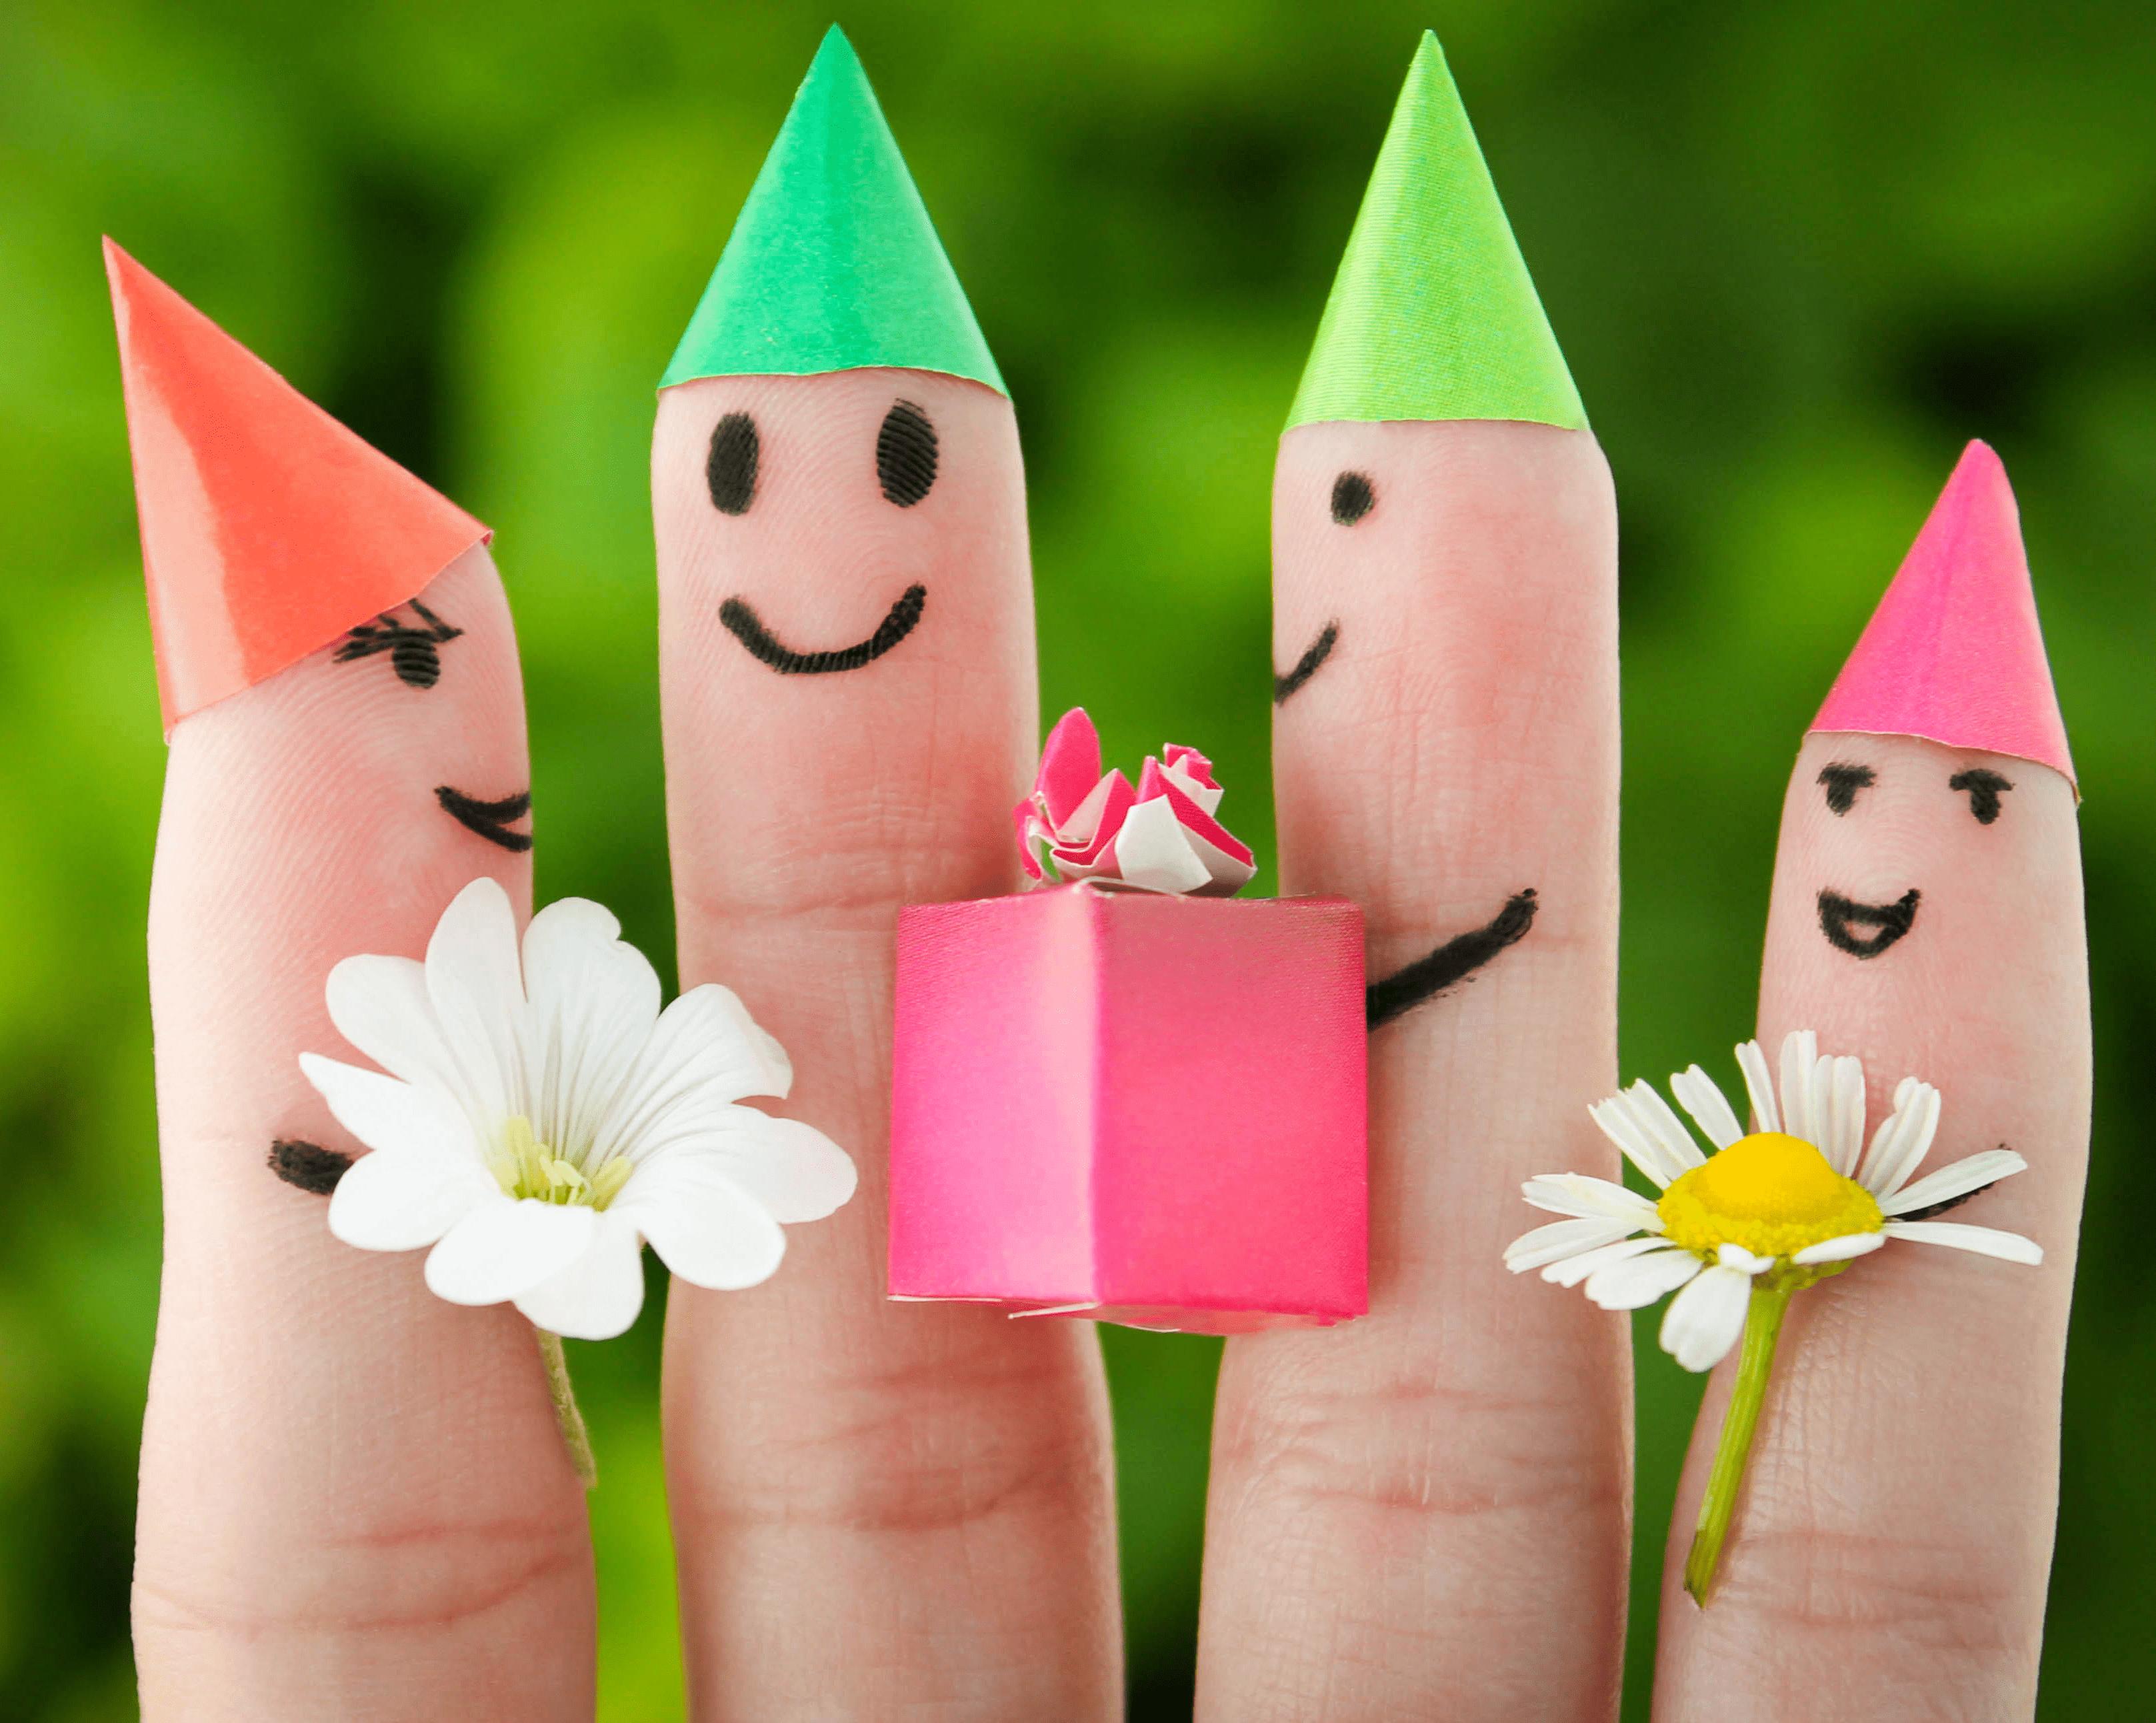 Diferentes tipos y calidades de prótesis para dedo